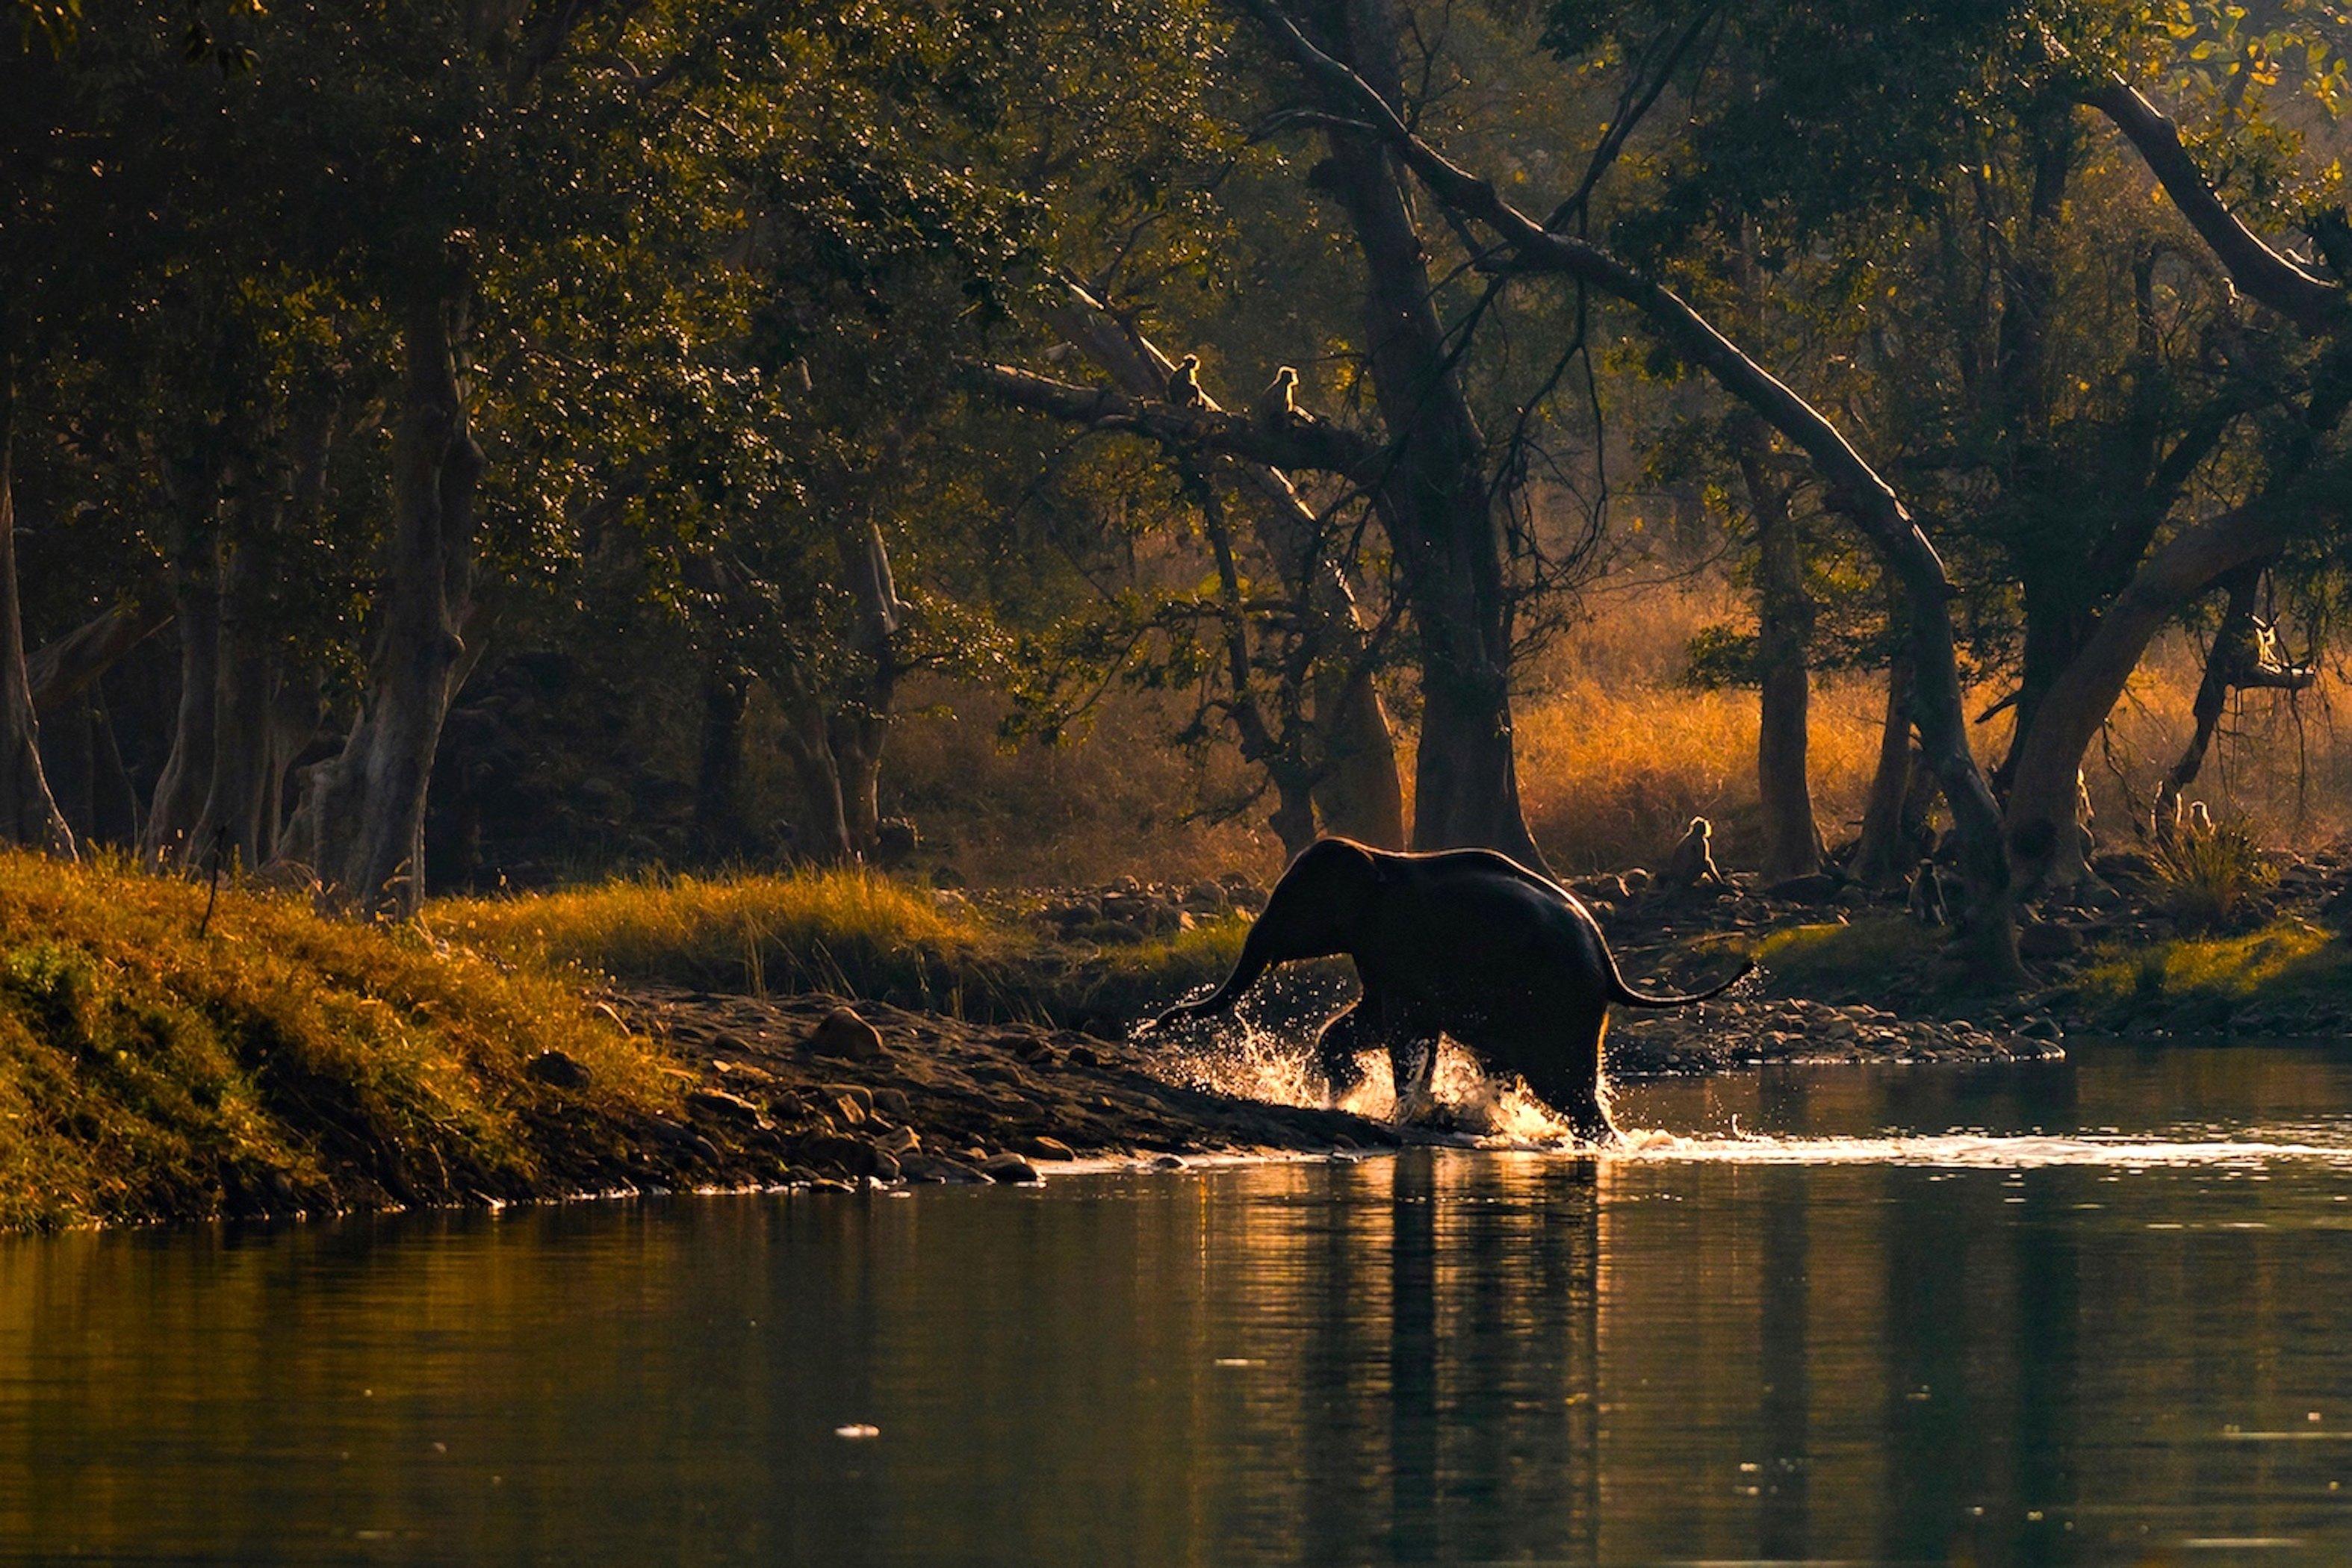 #wildlife, #nature, #elephant, #againstlight, #wilderness, #forest, pandey narendra kumar